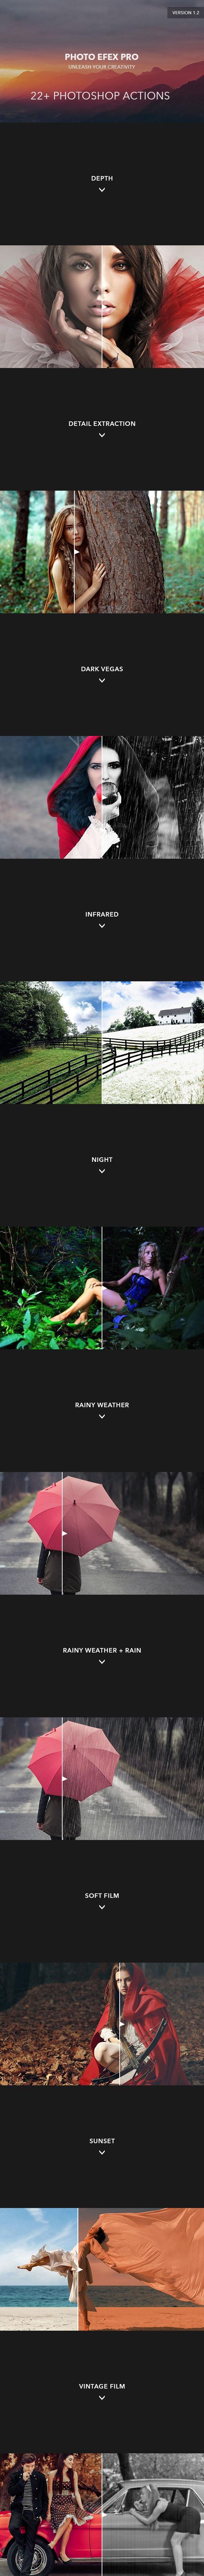 Photo Efex Pro Photoshop Actions - Actions Photoshop